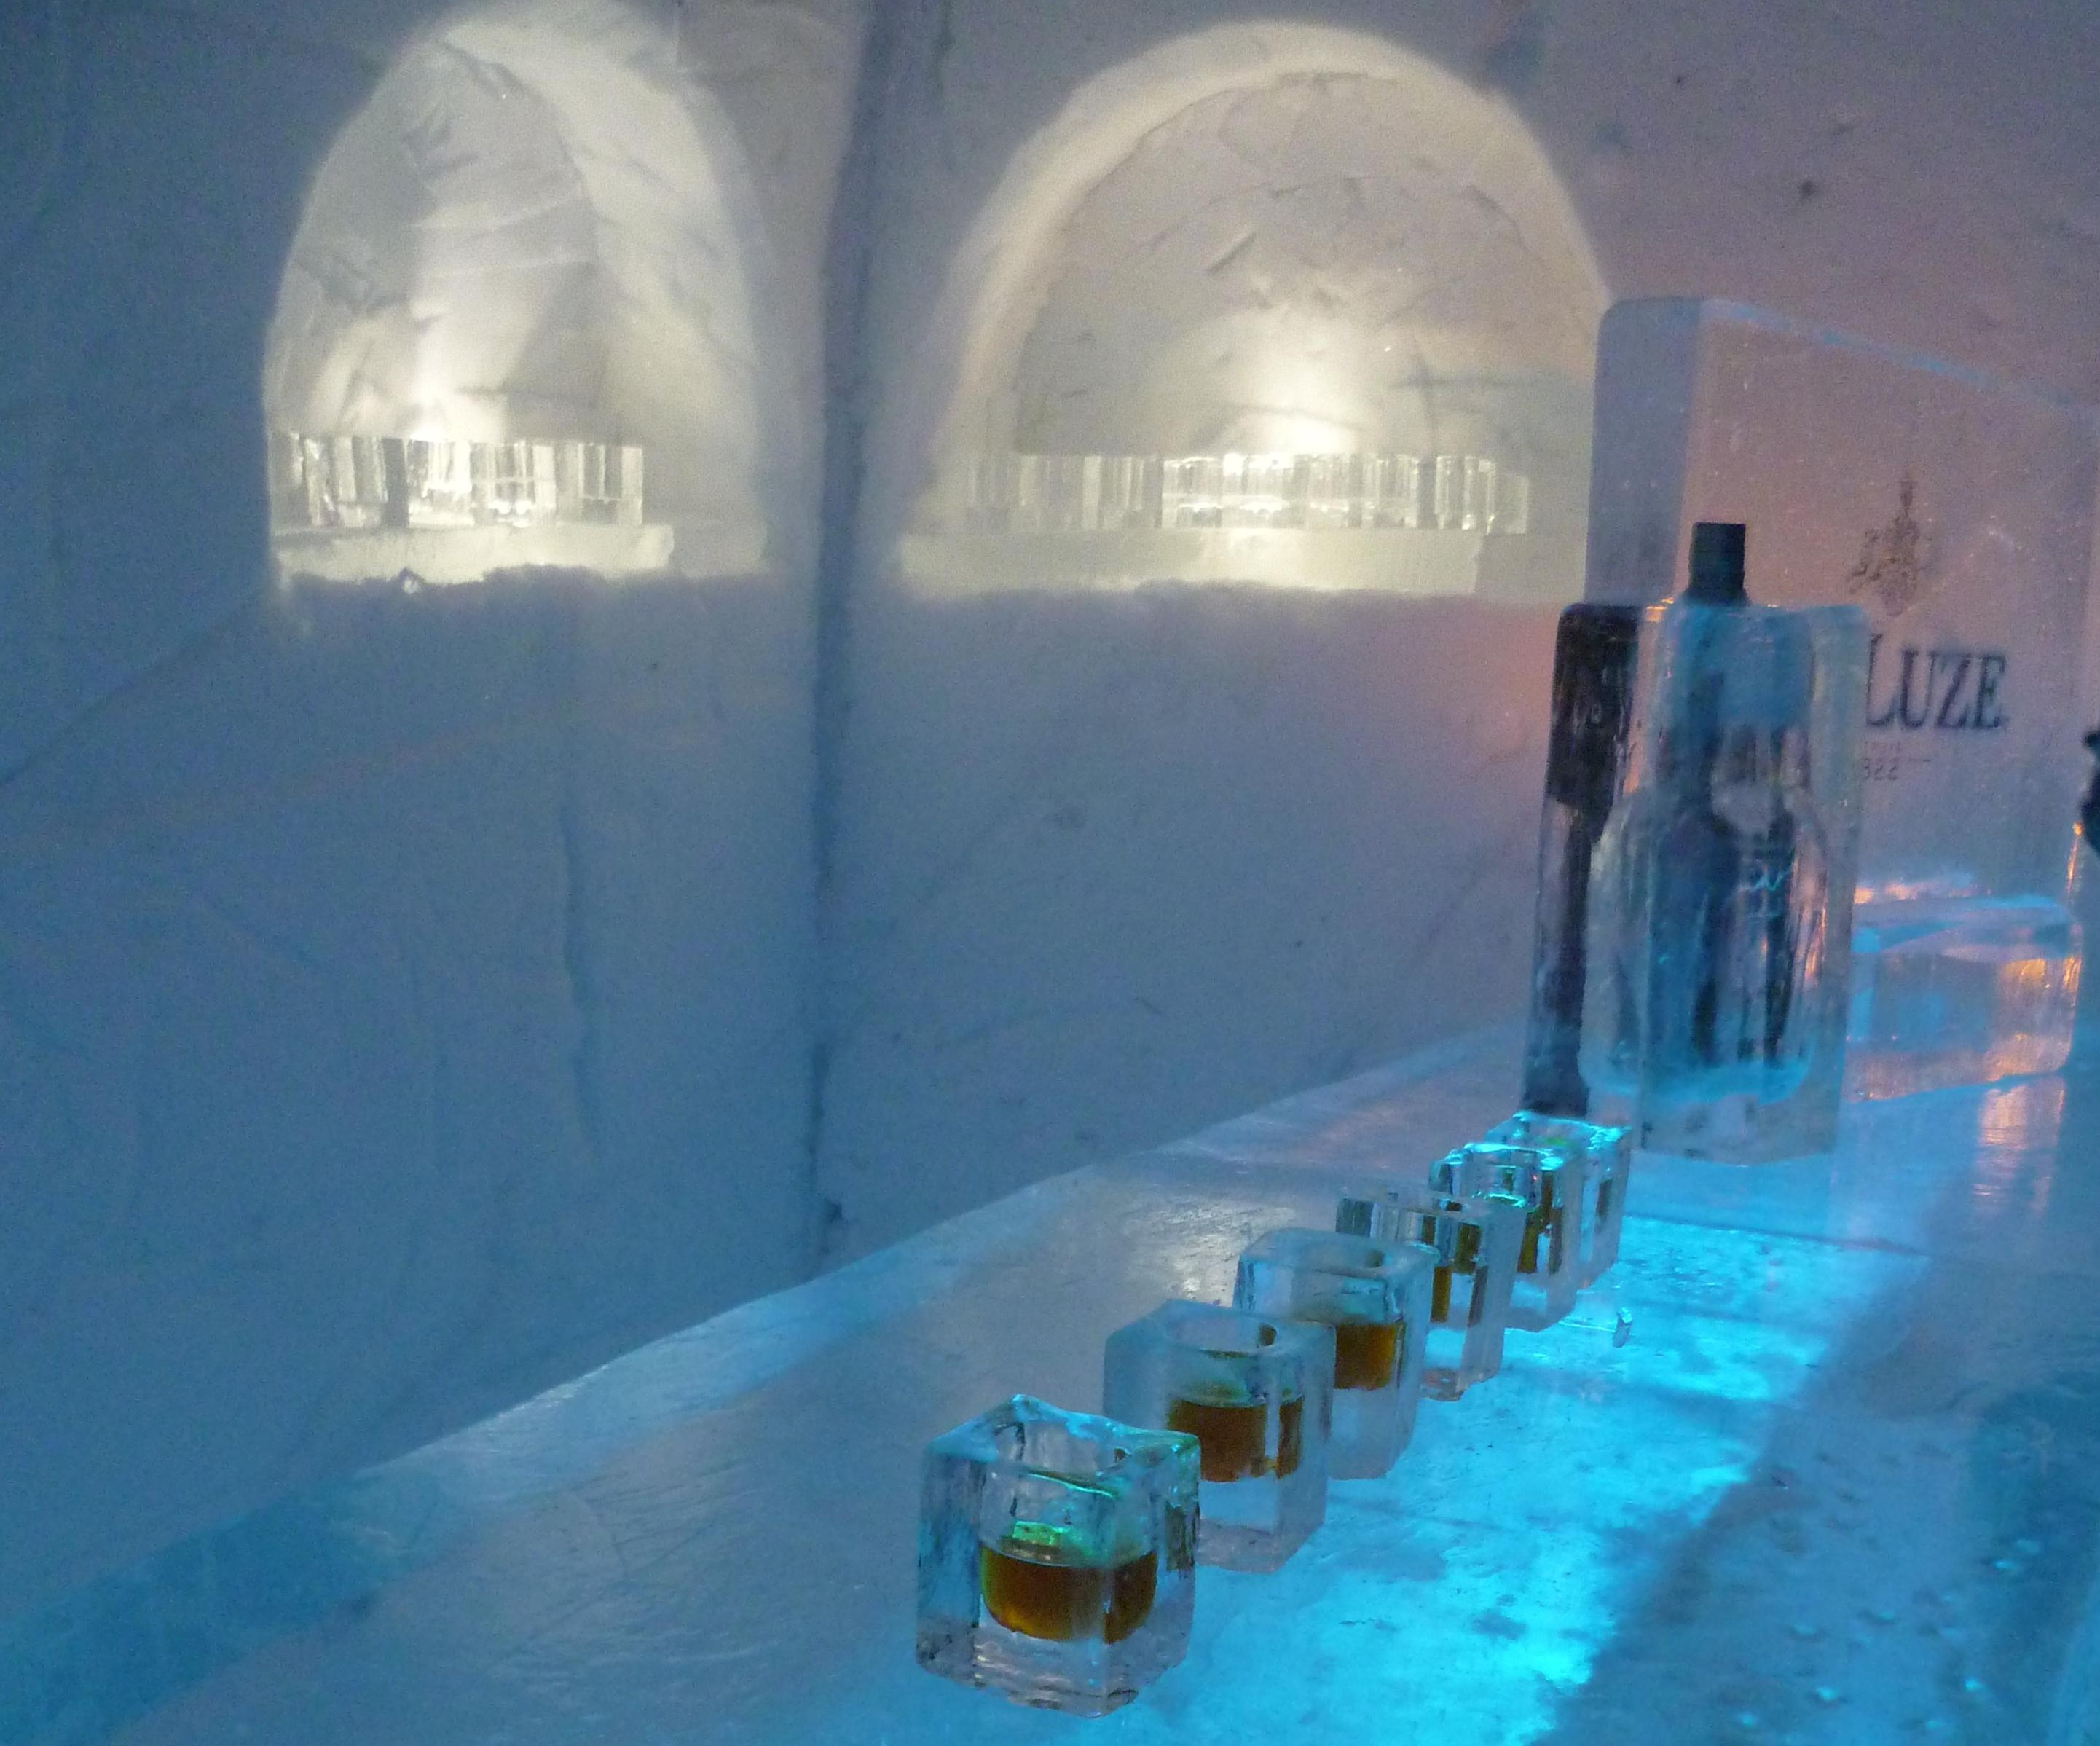 De Luze Ice Bar